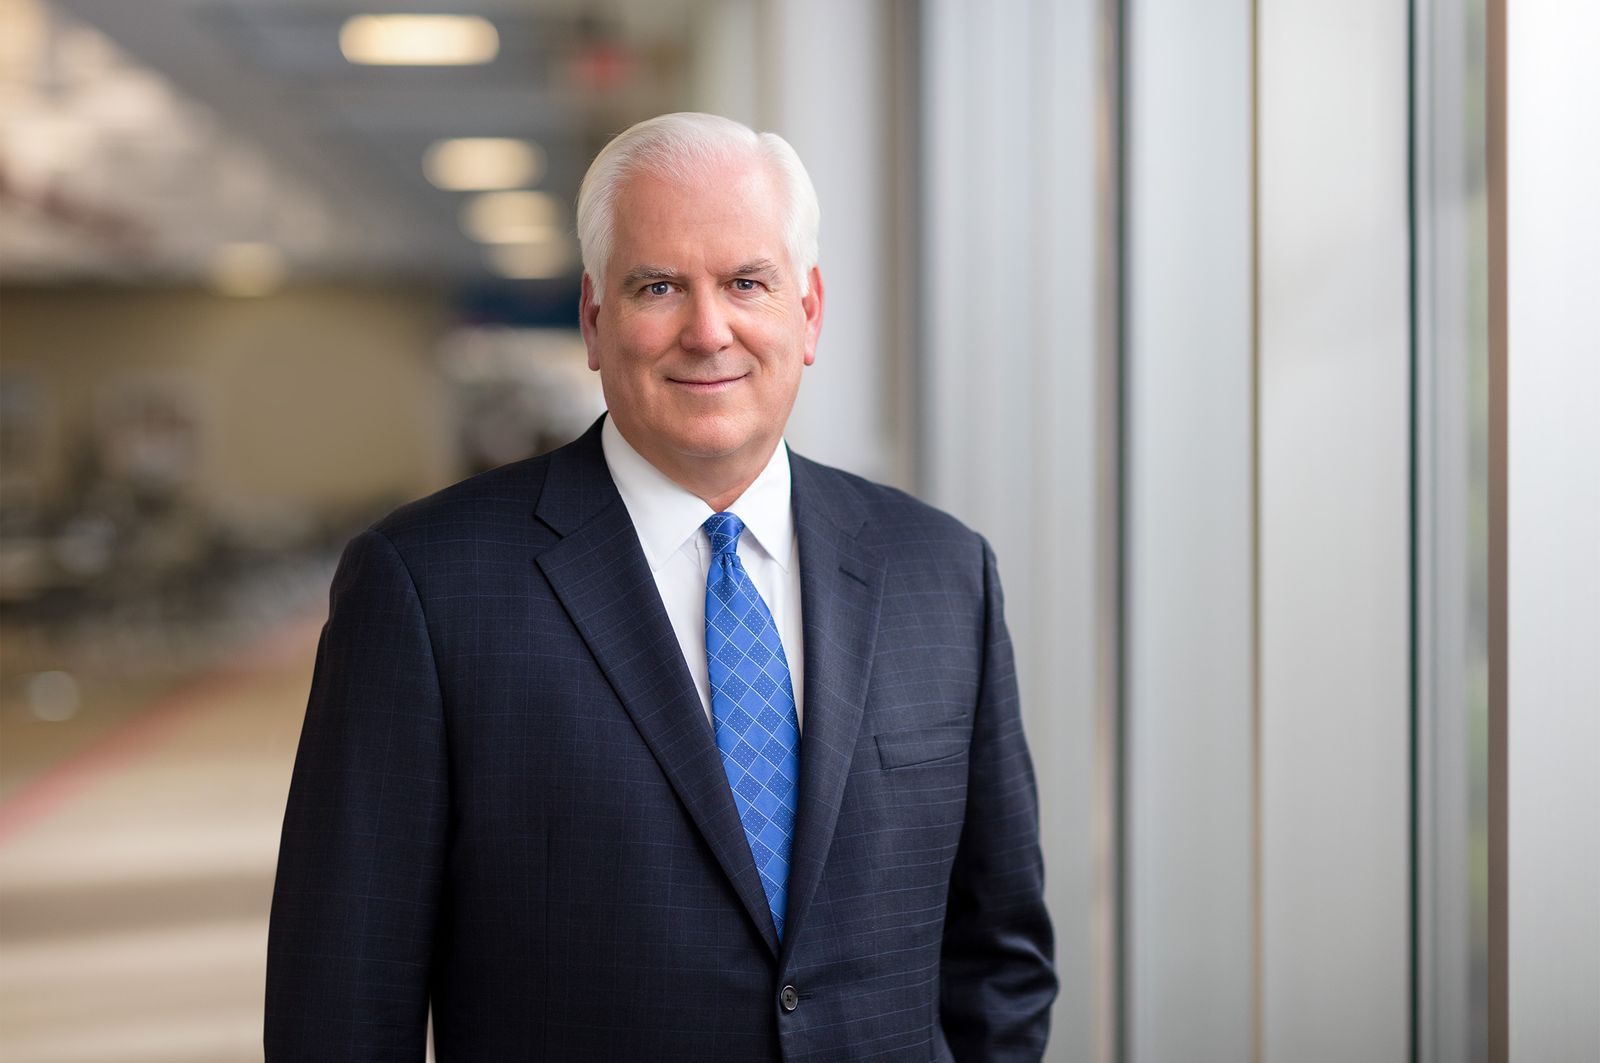 Abbott CEO Miles White